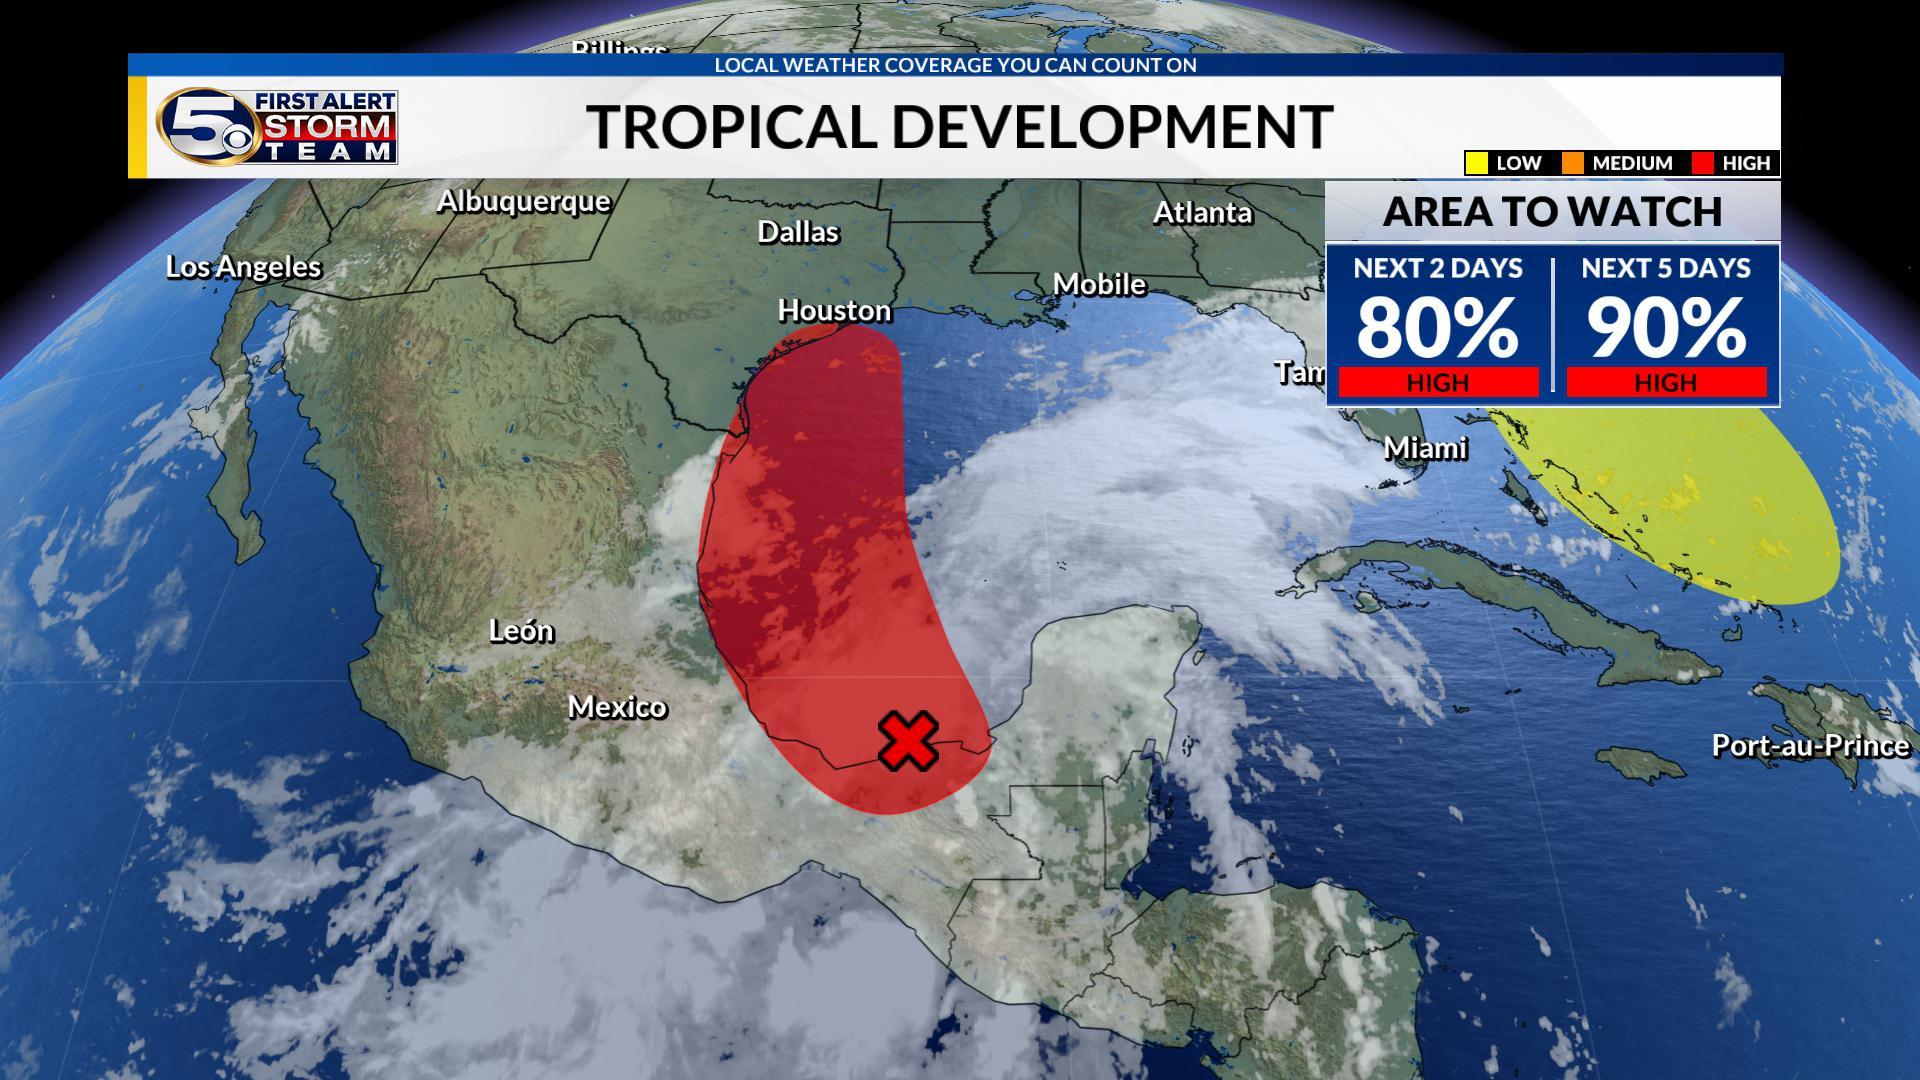 Peak of the Atlantic Hurricane Season, Watching two potential storms